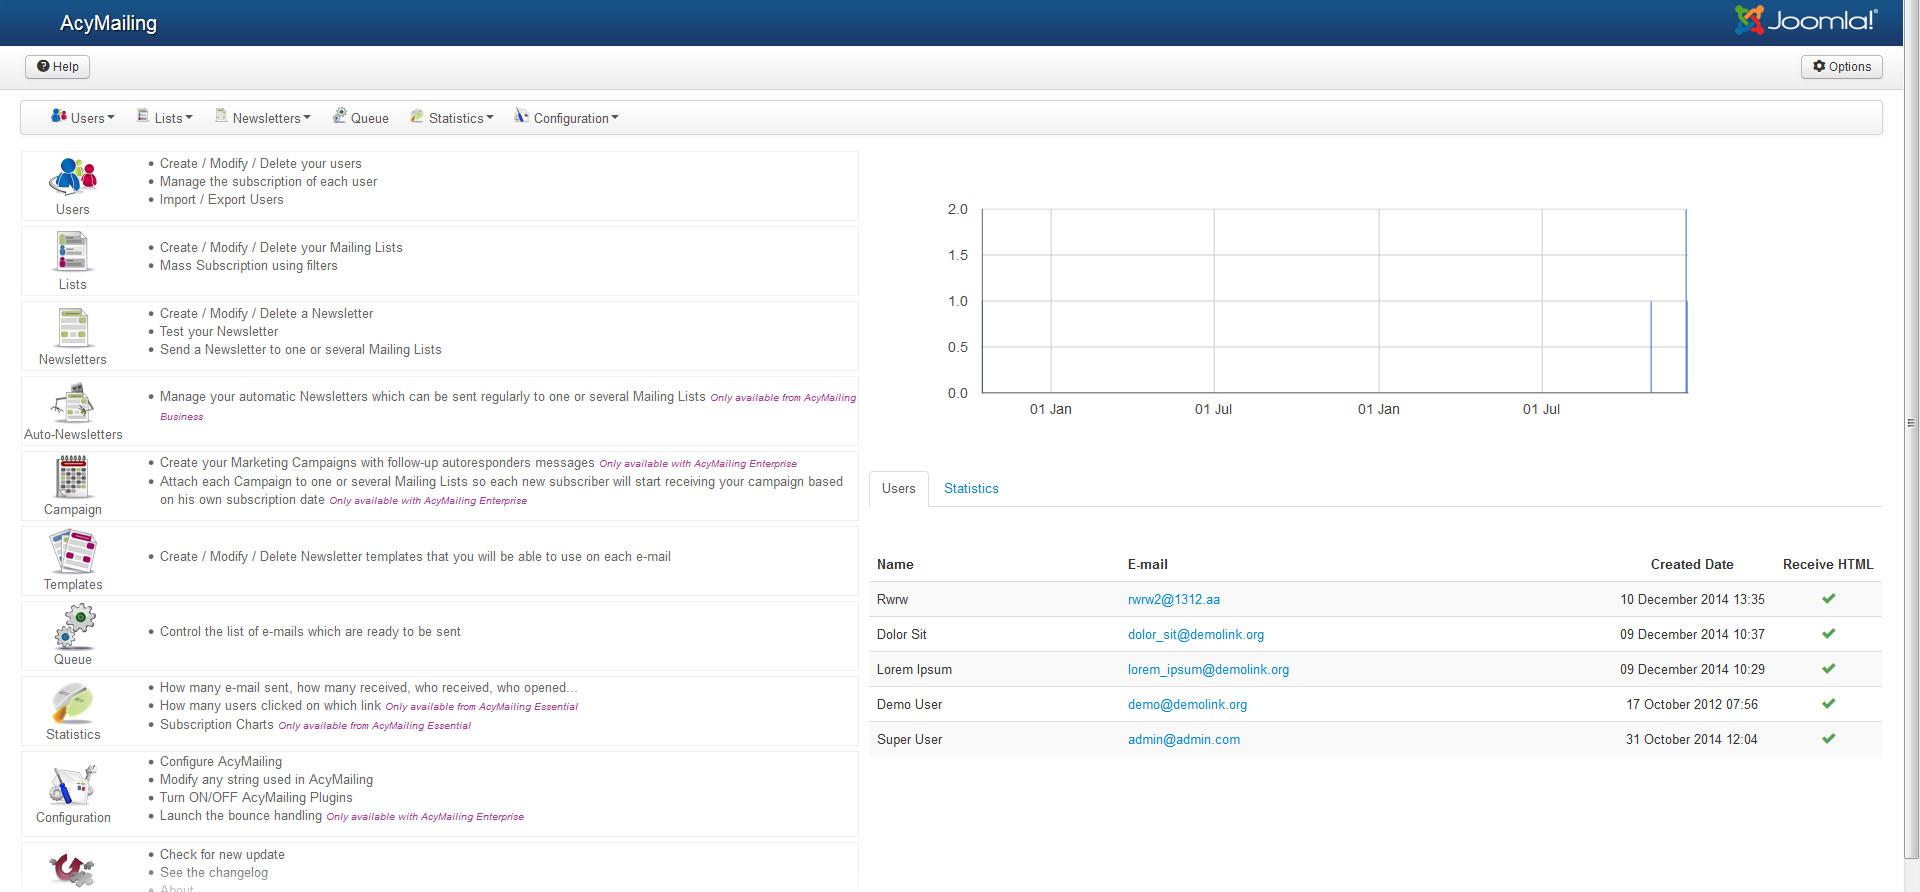 Joomla 3.x Documentation